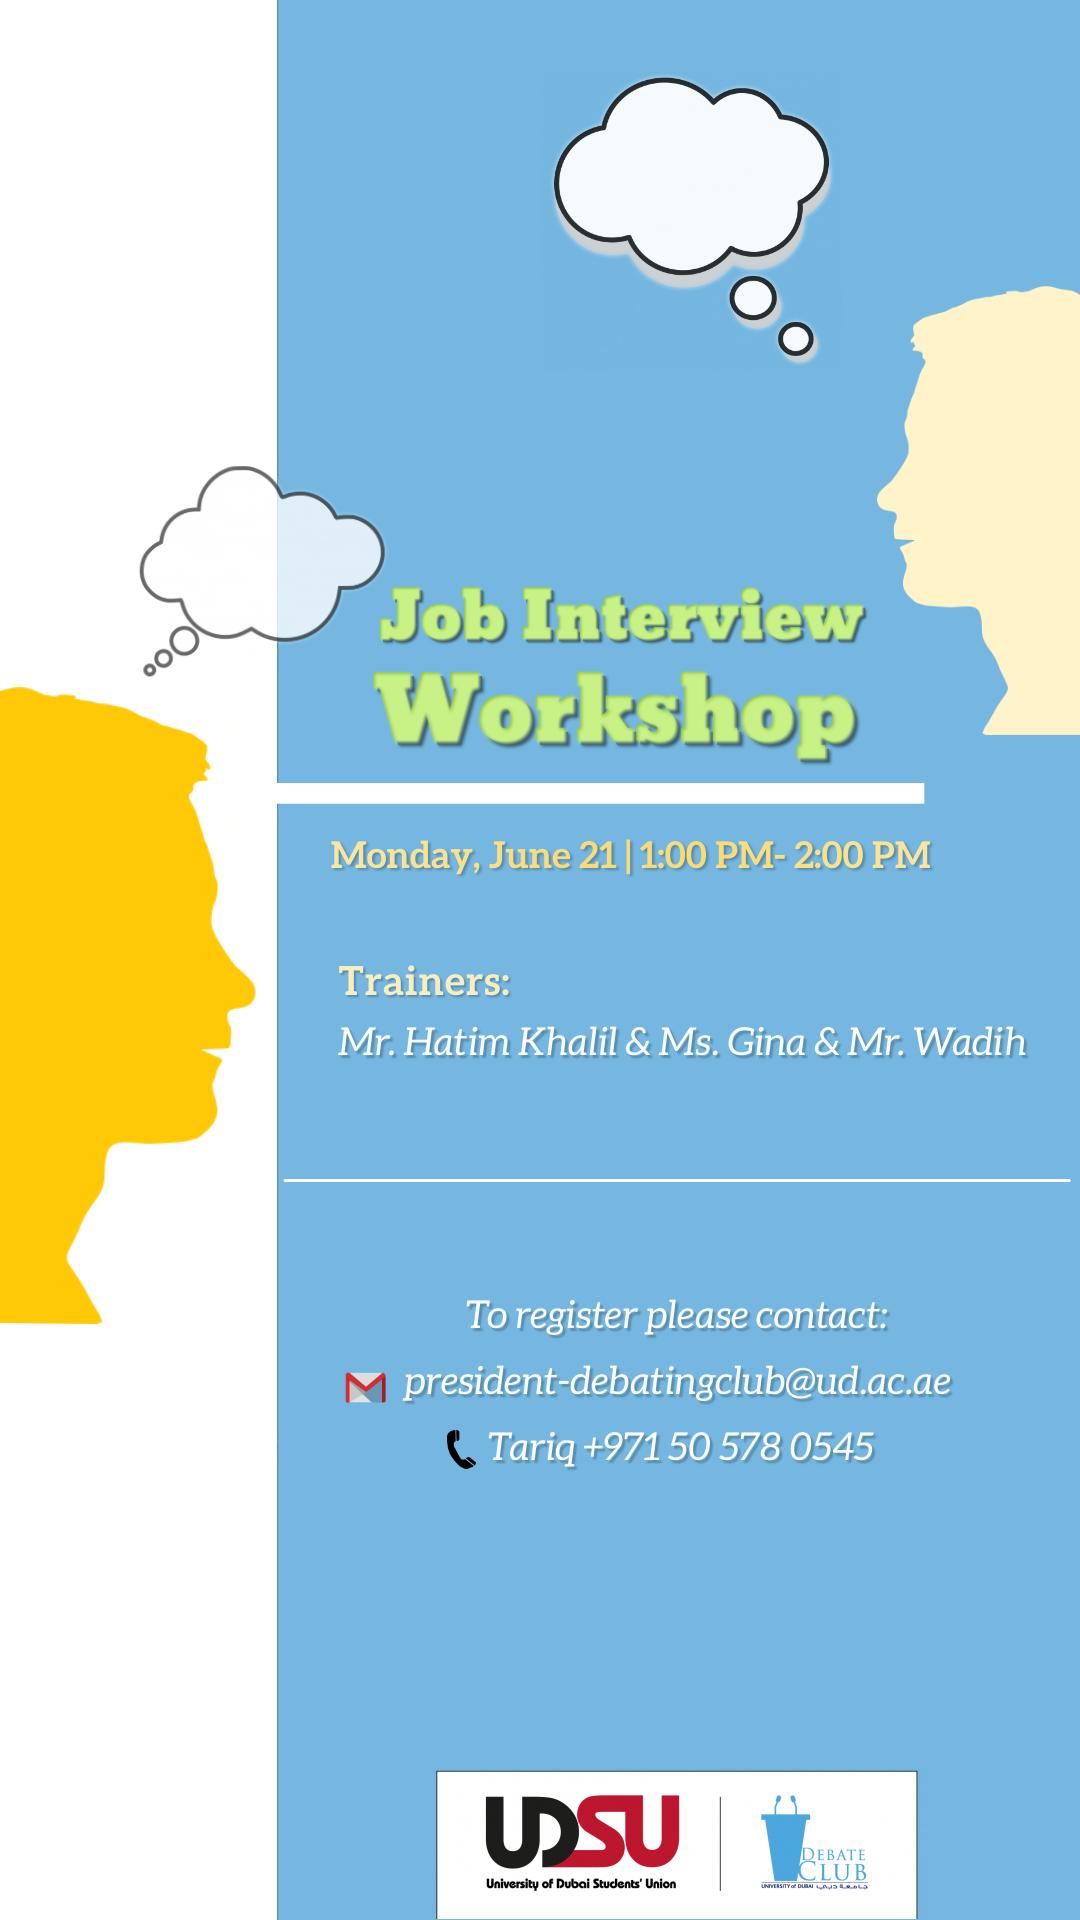 Job Interview Workshop